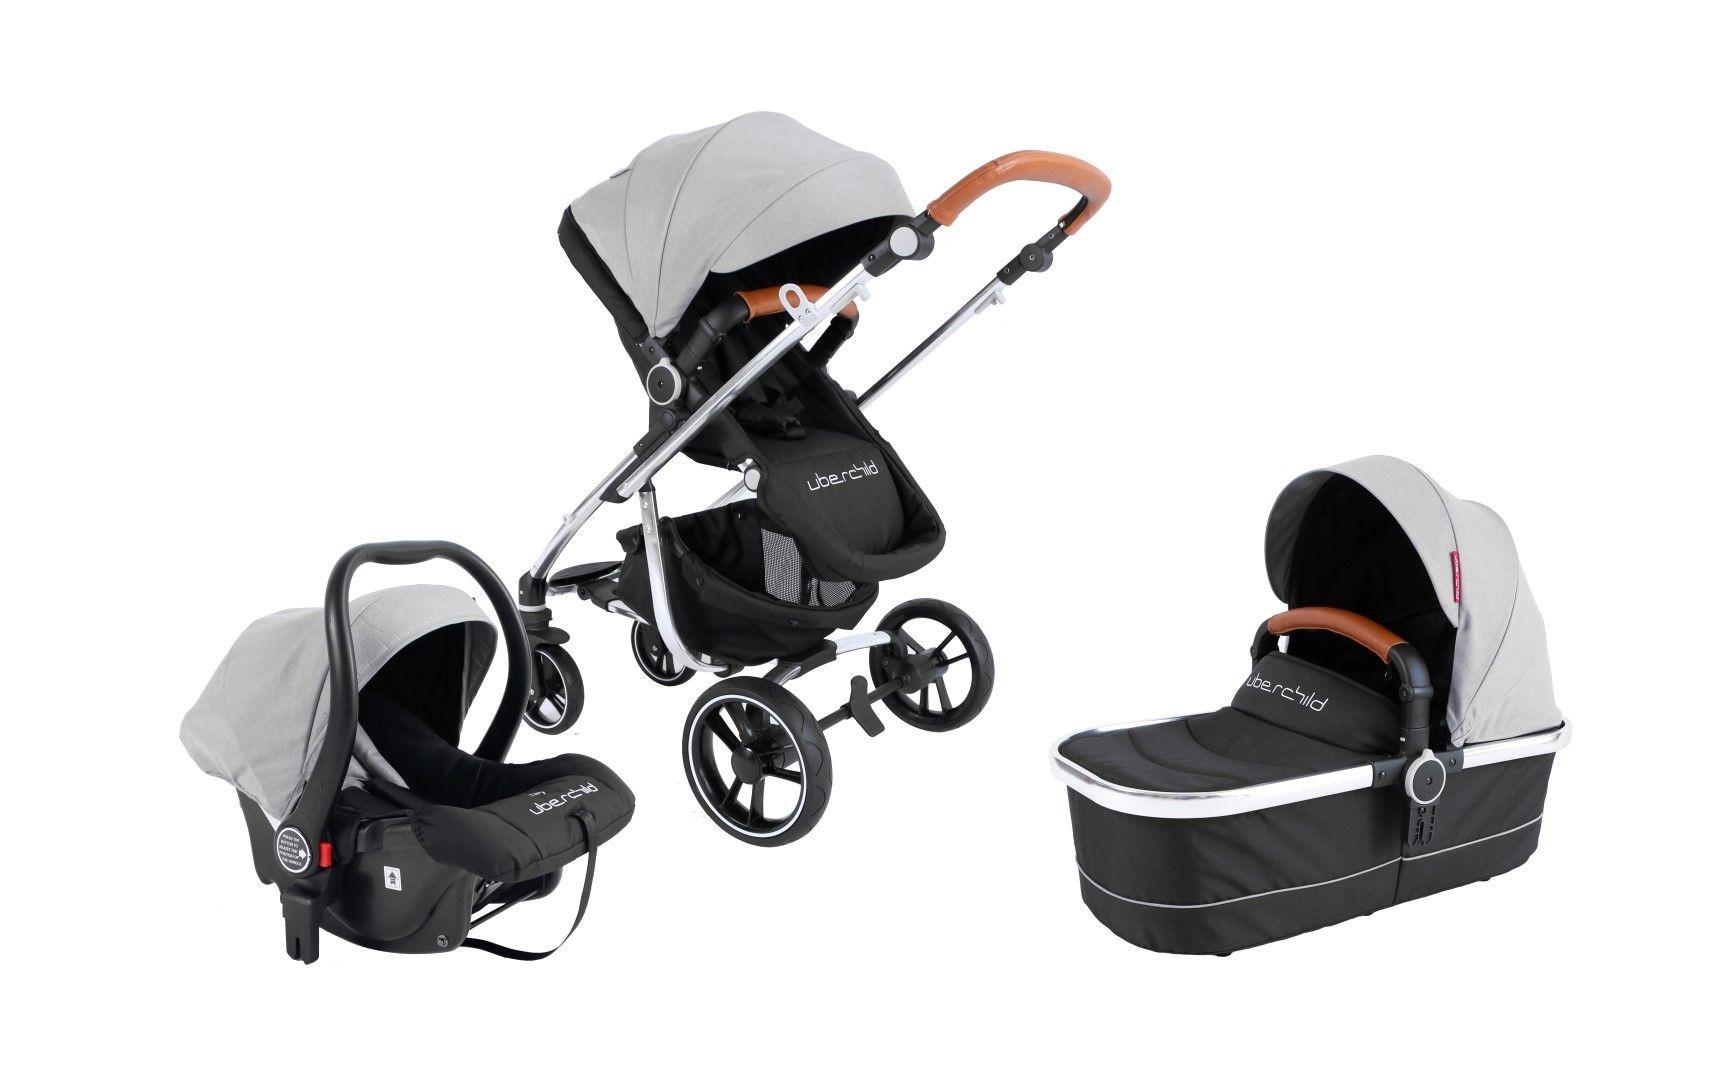 Uberchild Baby Seat For Sale In Lancaster Lancashire Preloved